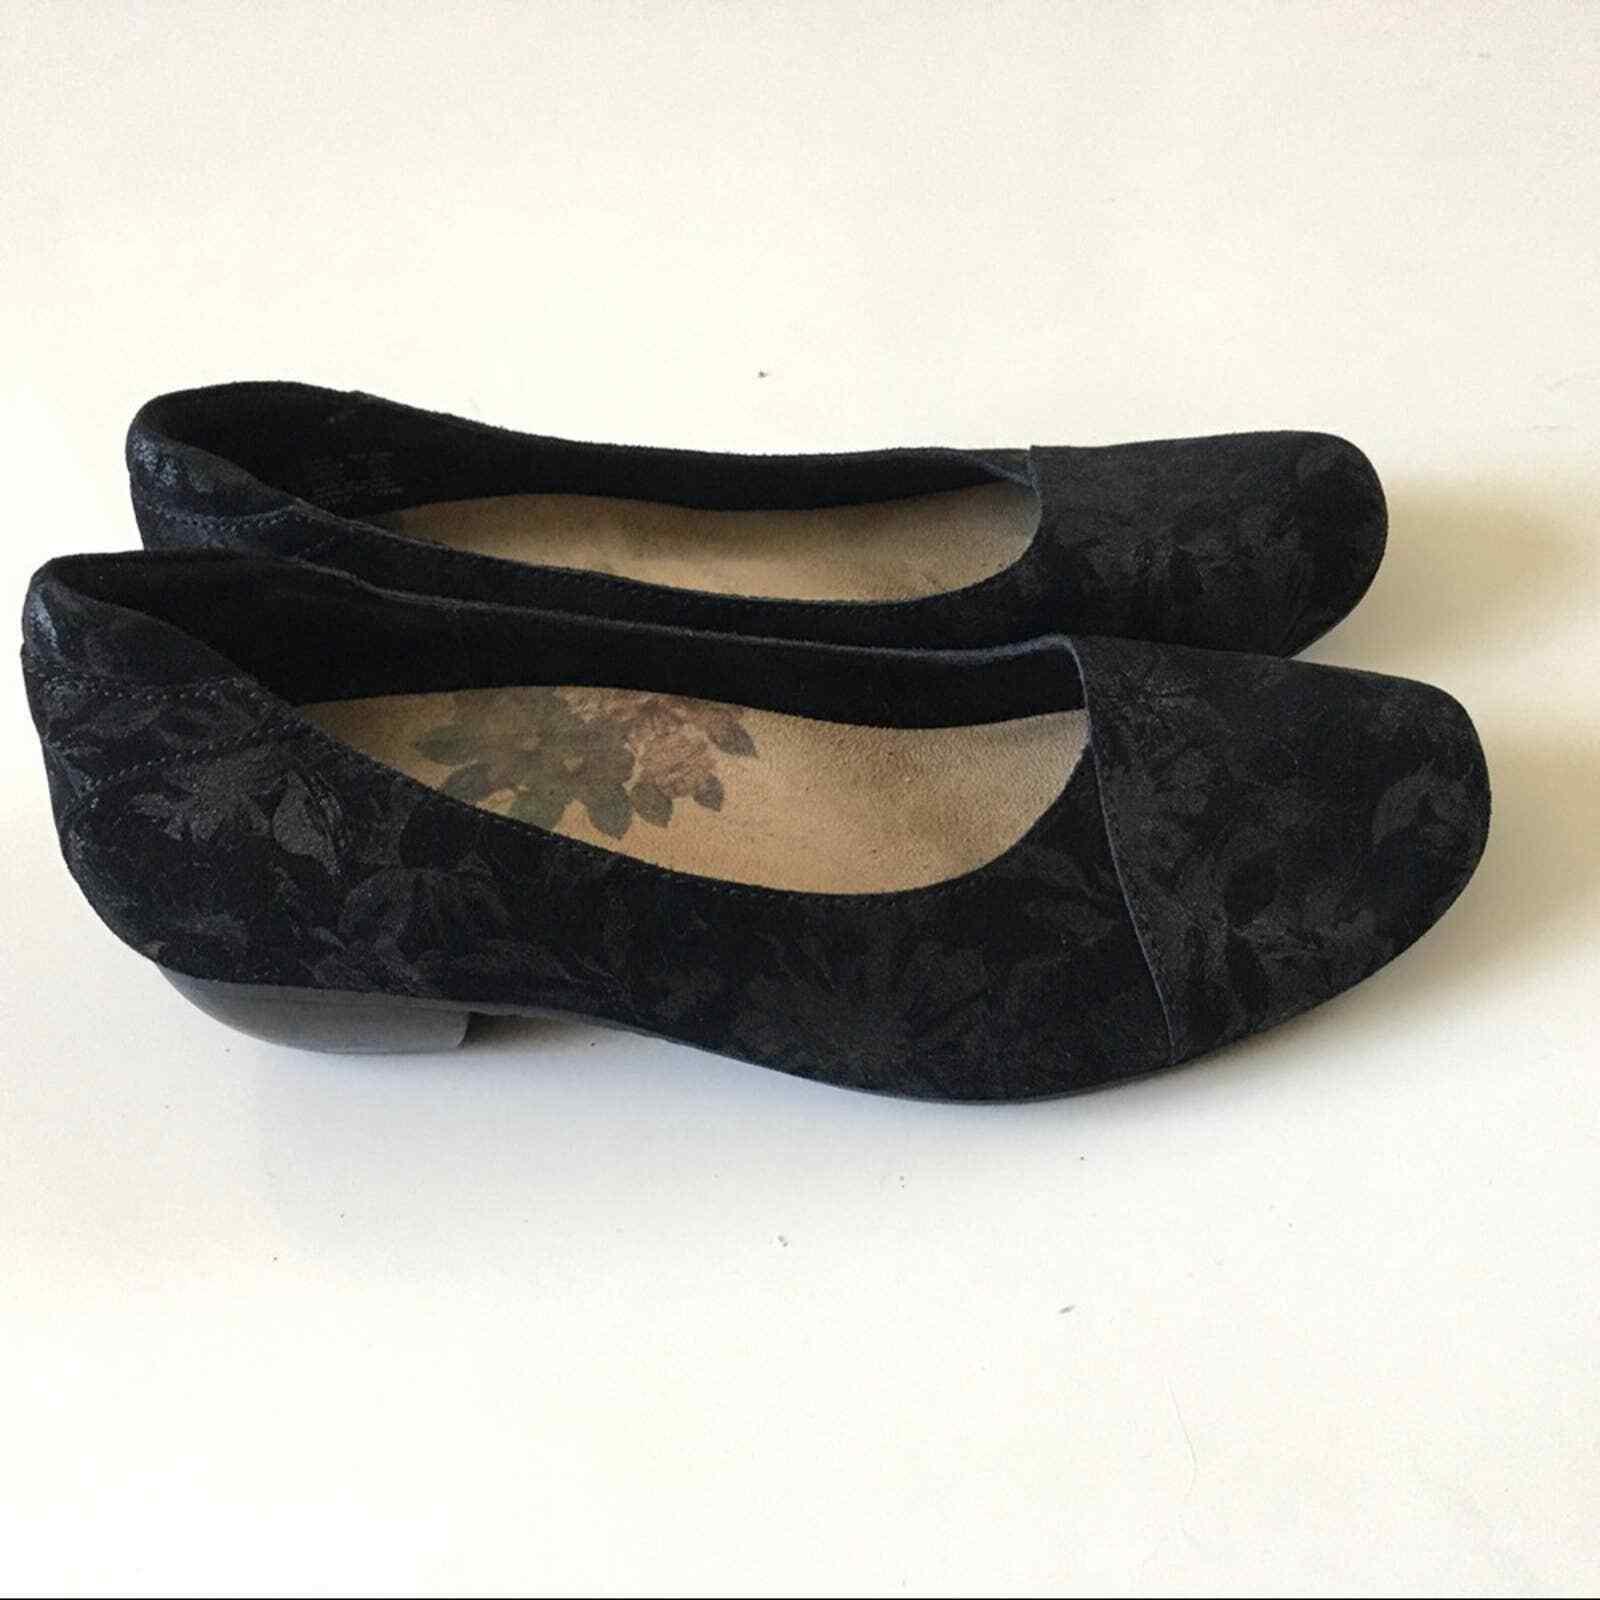 Taos Debut Black Floral Suede Slip On Shoes